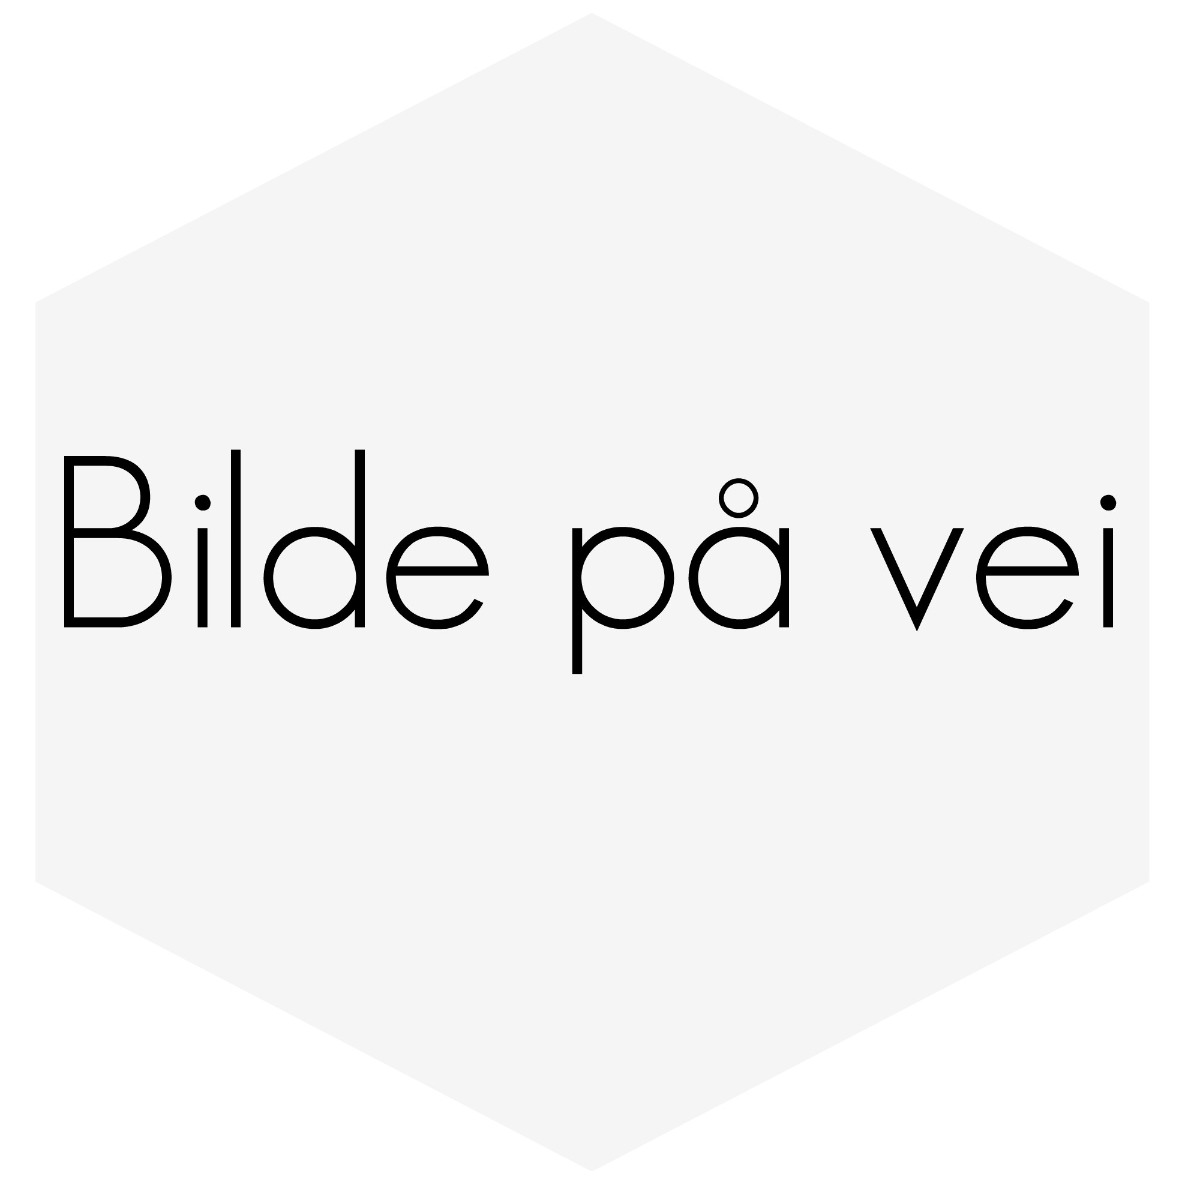 Vindavvisersats Volvo V70N og XC70 2000-2007 type som limes